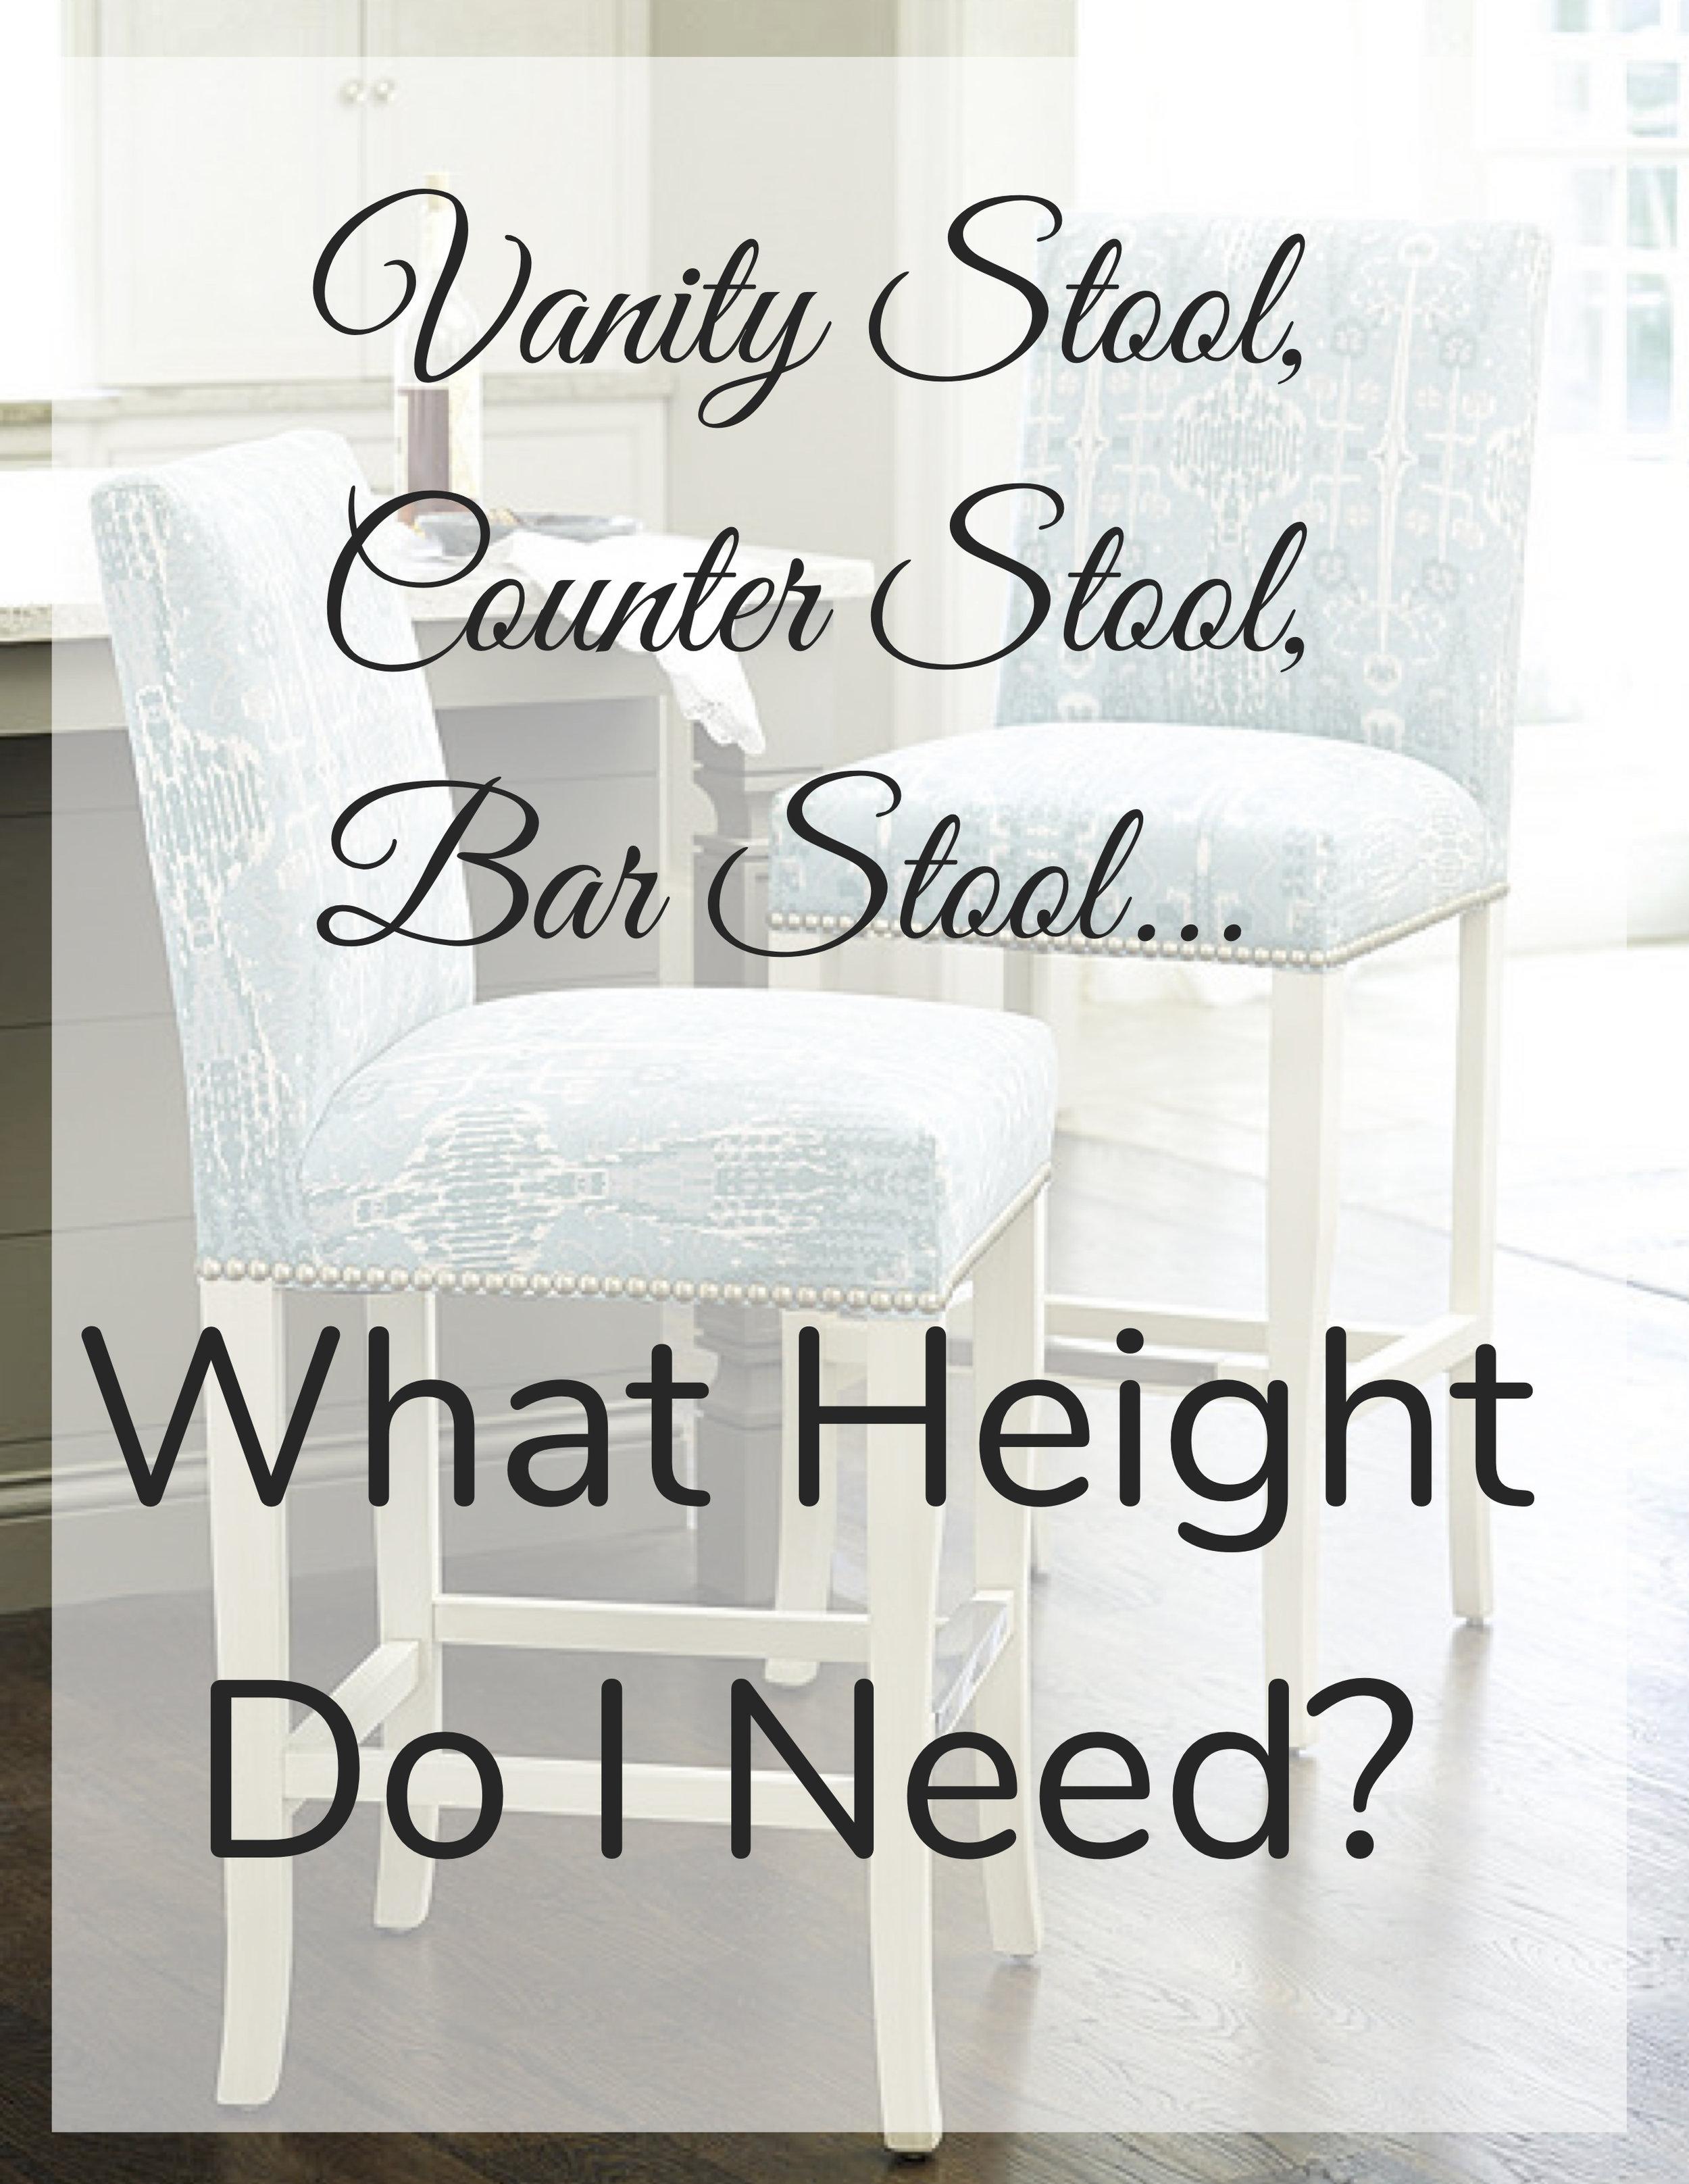 Vanity Stool,Counter Stool,Bar Stool...What height do I need_.jpg